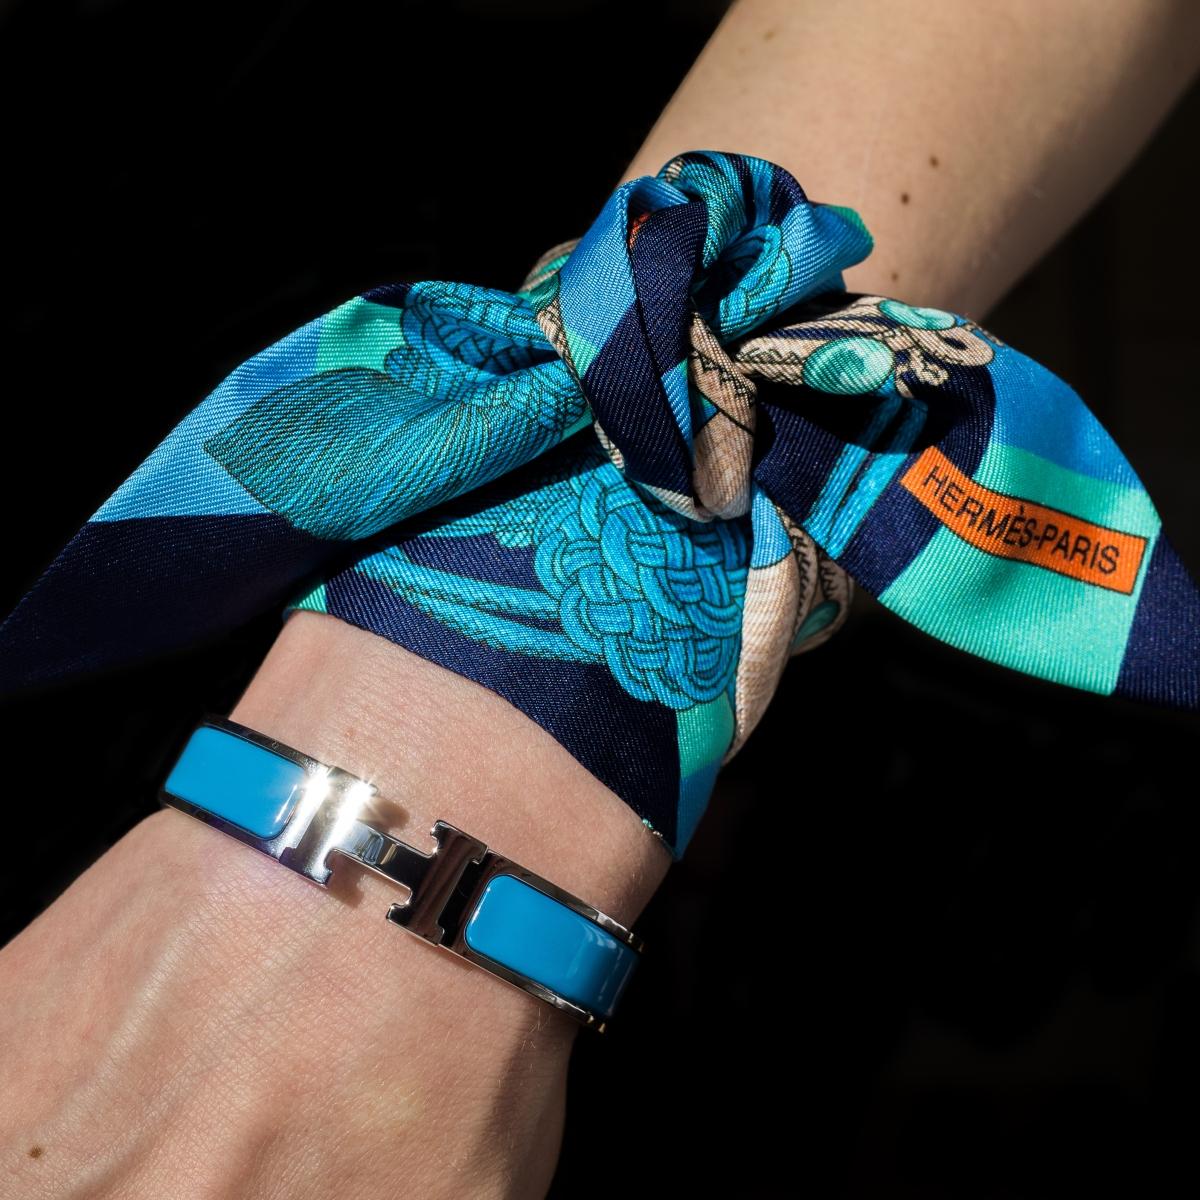 Hermes Clic H, Hermes enamel bracelet, Hermes jewelry, Hermes Clic Clac, bleu cielo, sky blue